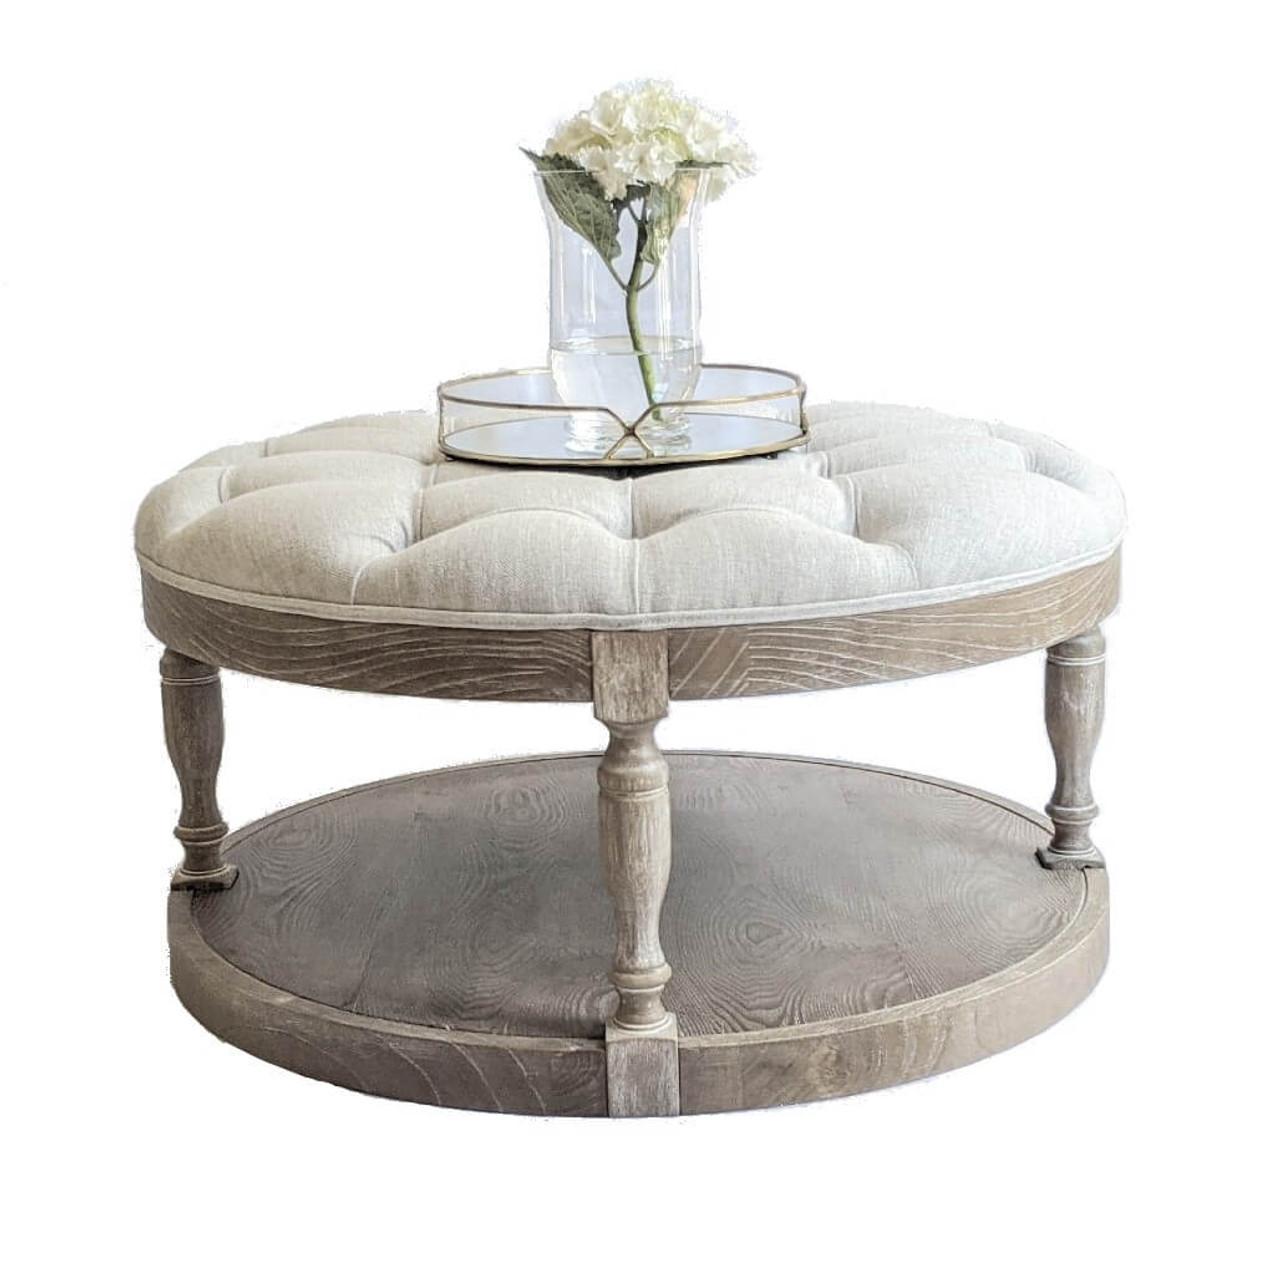 hamptons round coffee table tufted ottoman whitewash oak oatmeal linen